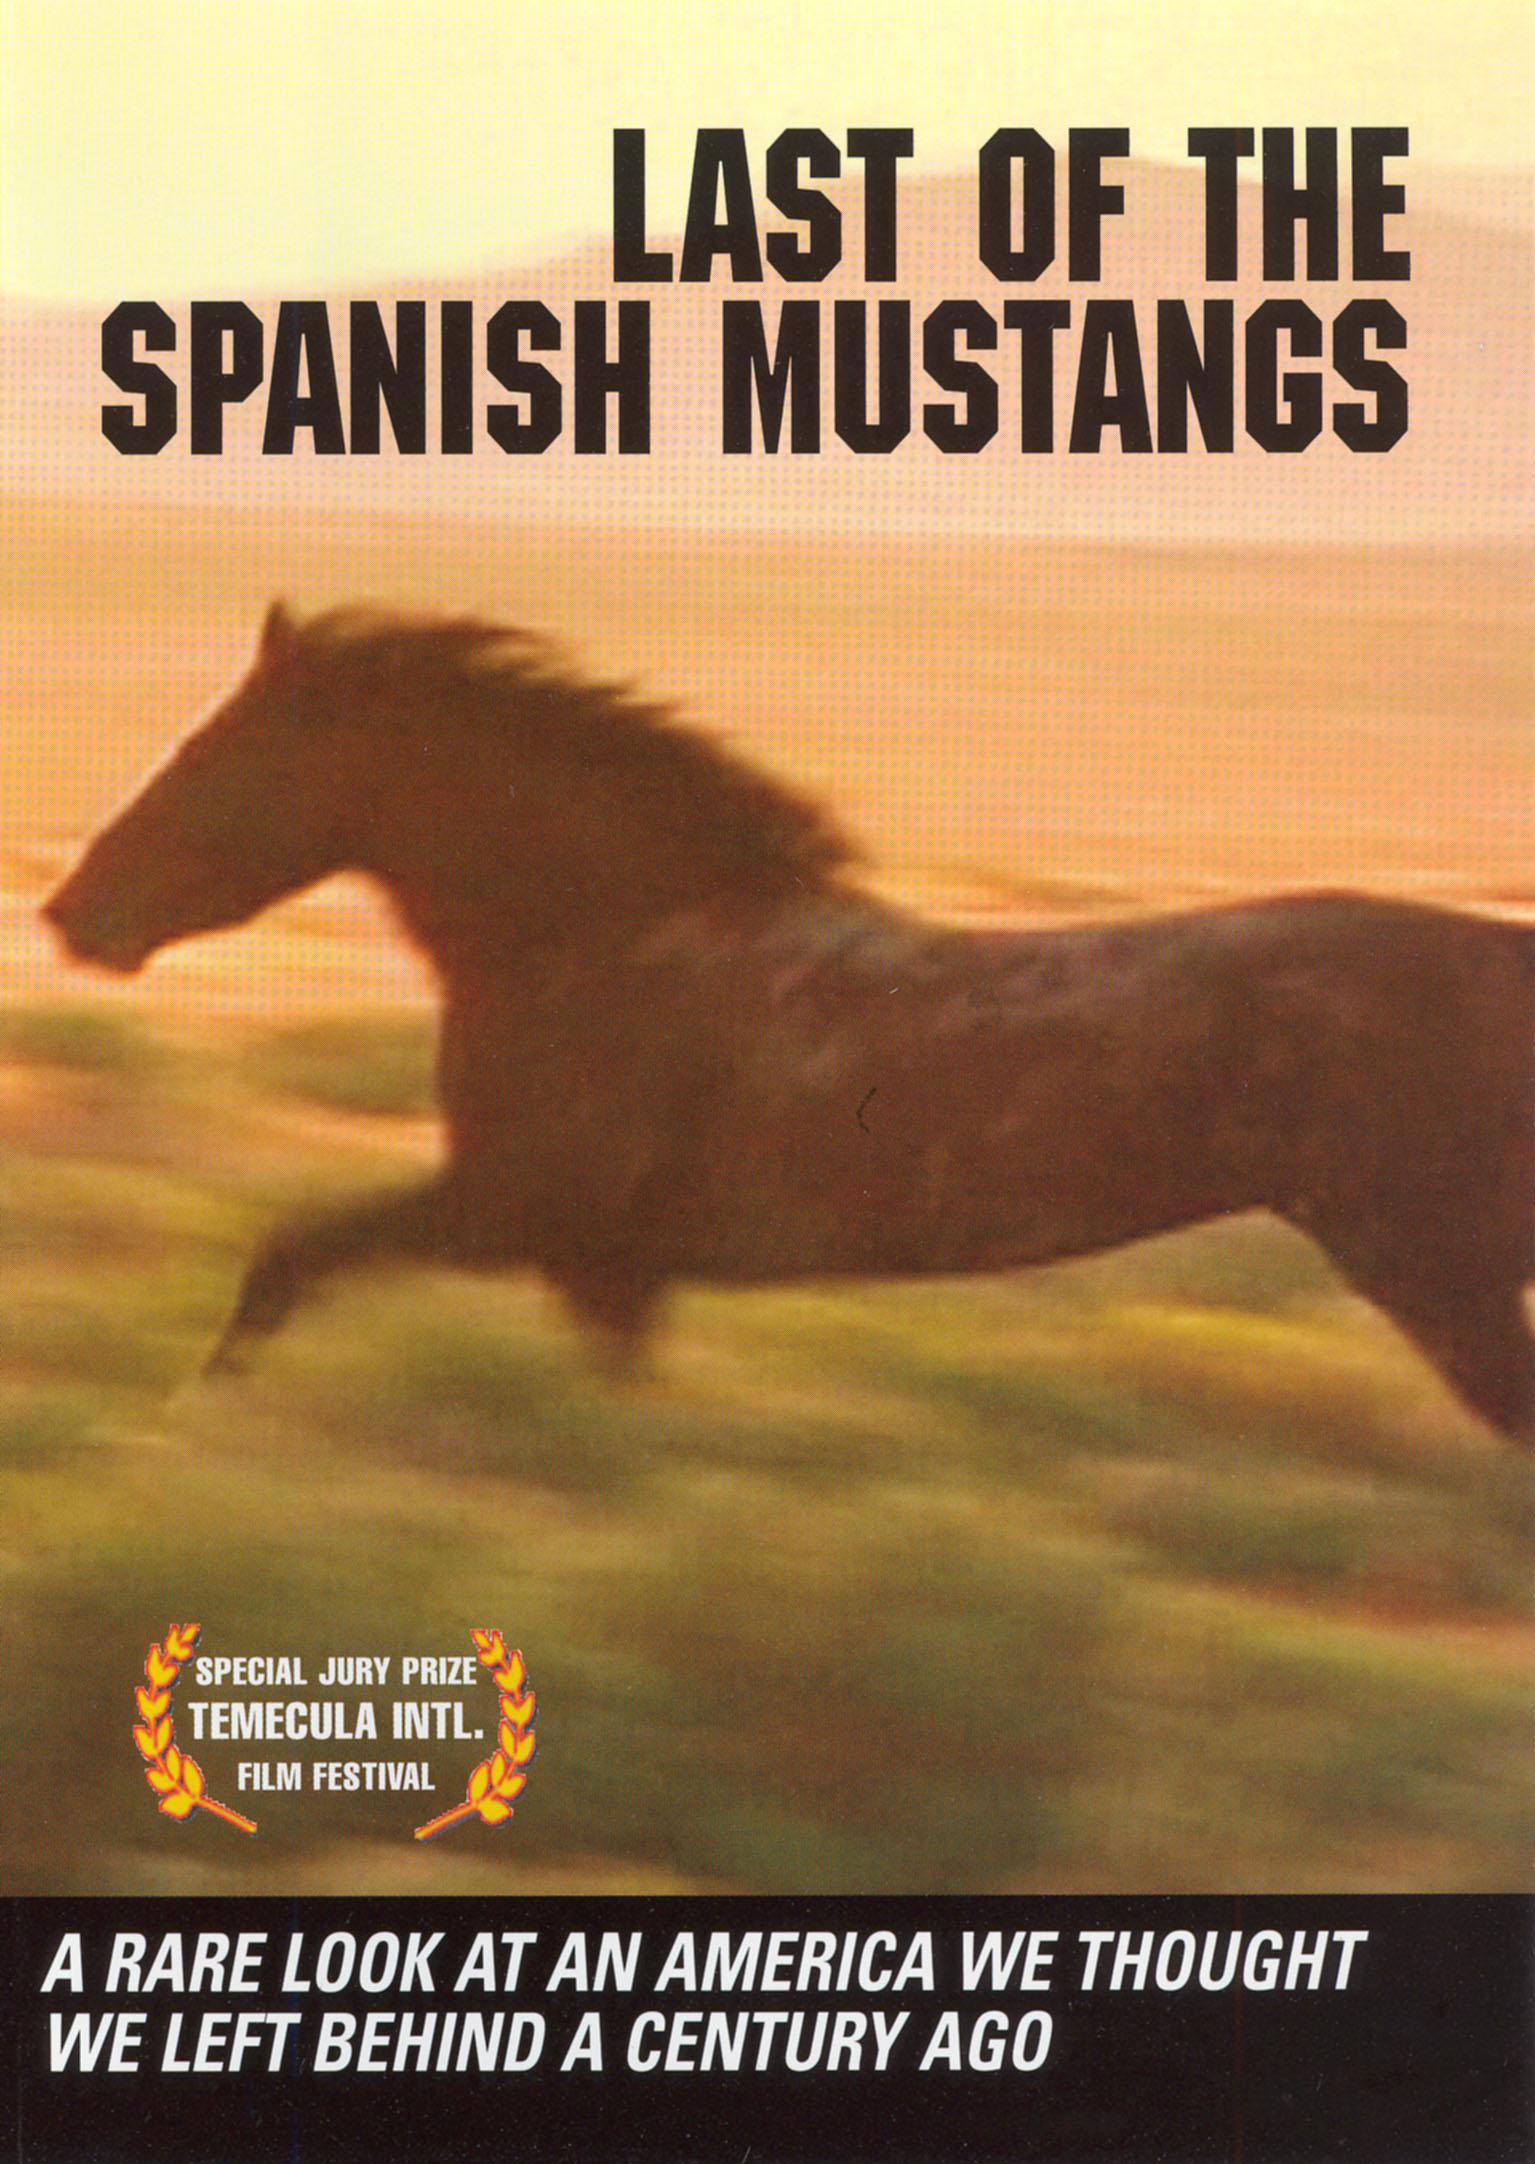 Last of the Spanish Mustangs